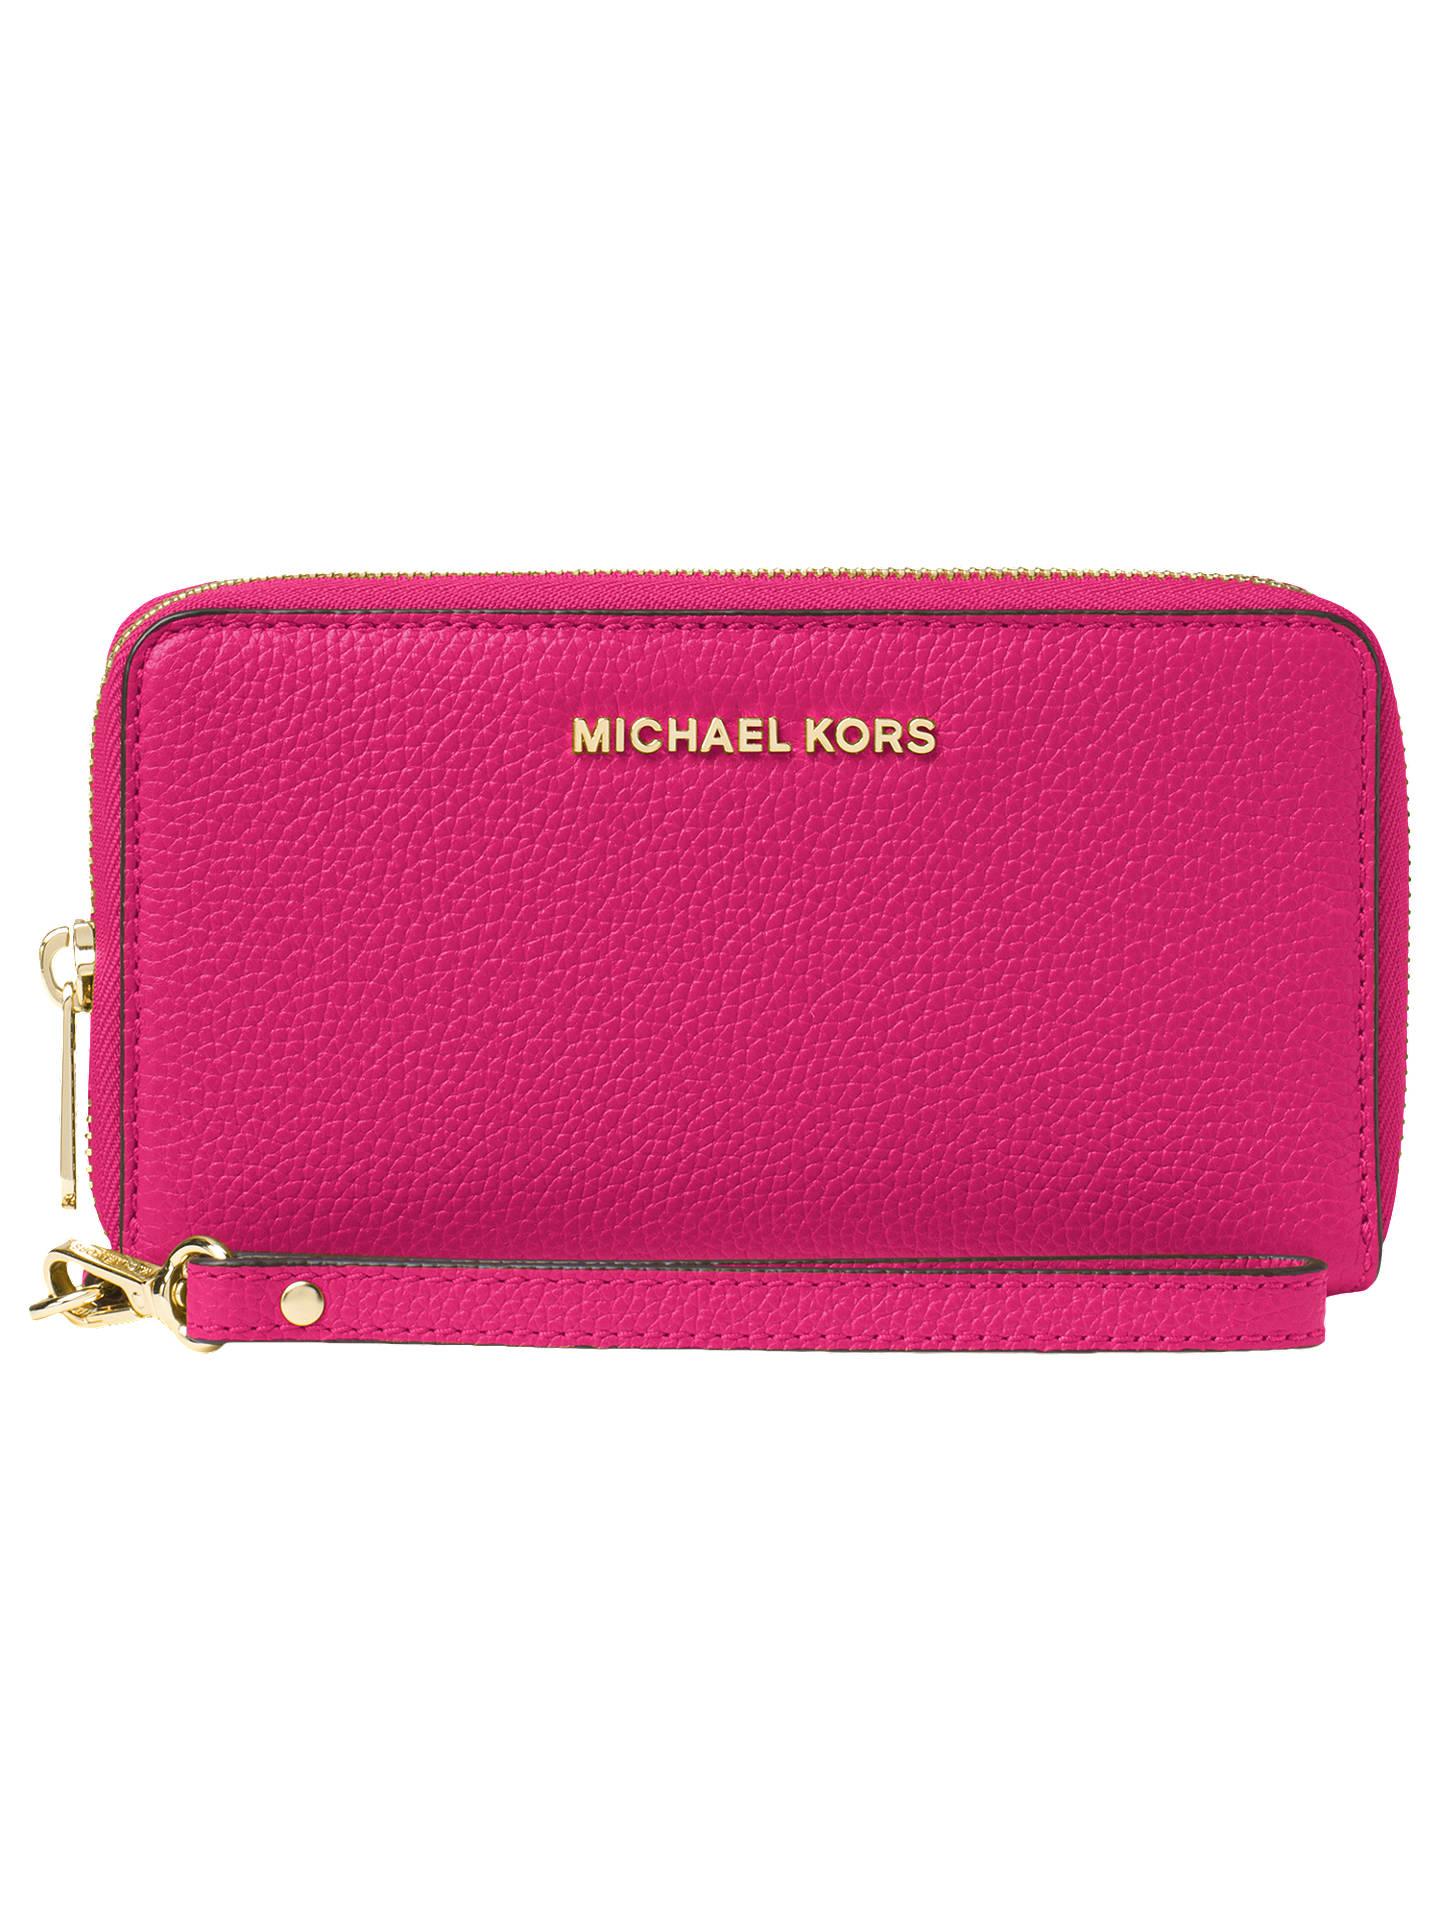 69d1e3068af8 MICHAEL Michael Kors Mercer Large Leather Phone Case Purse at John ...